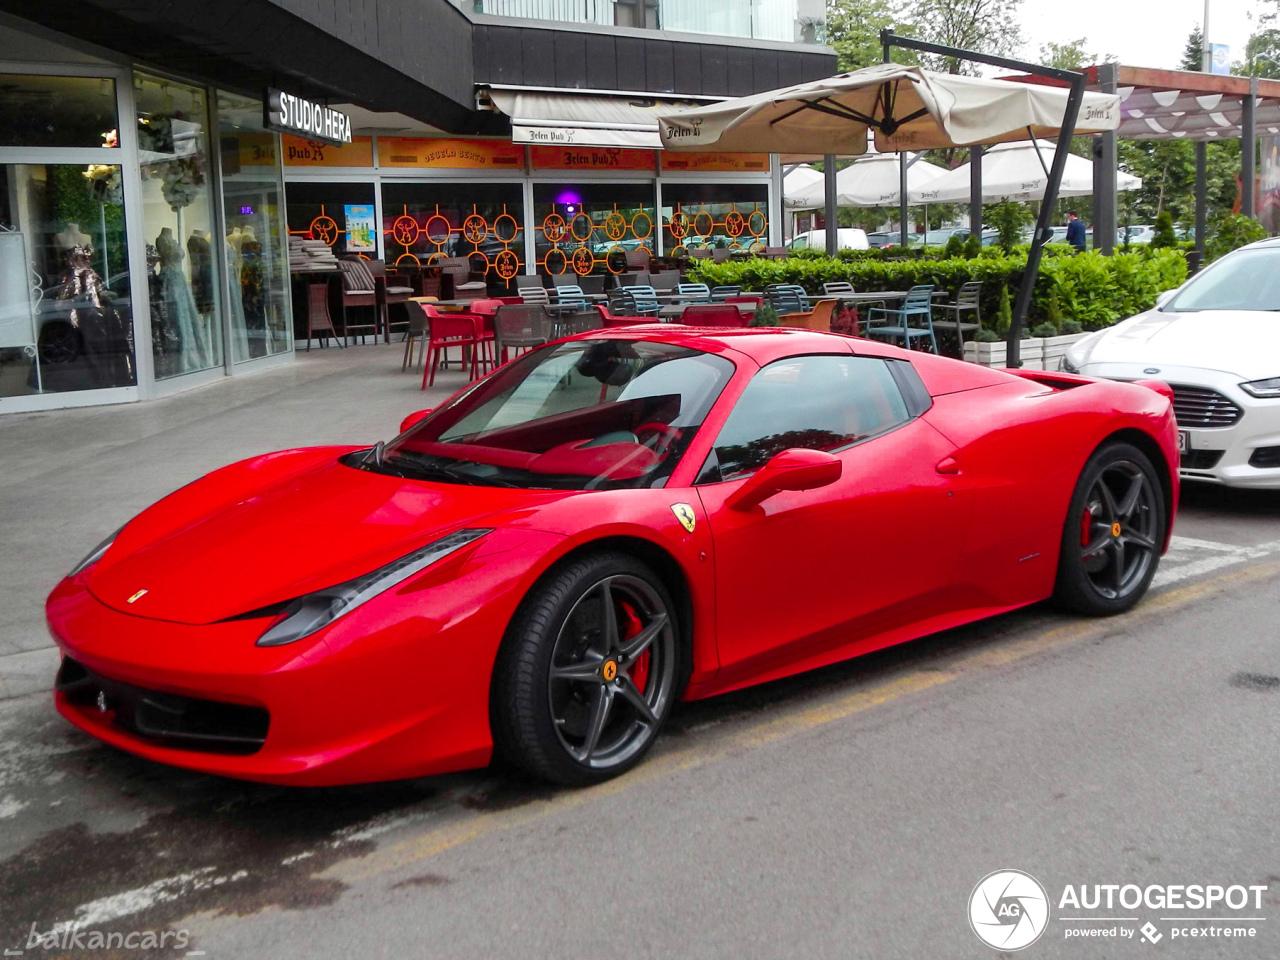 Ferrari 458 Spider - 29 May 2019 - Autogespot